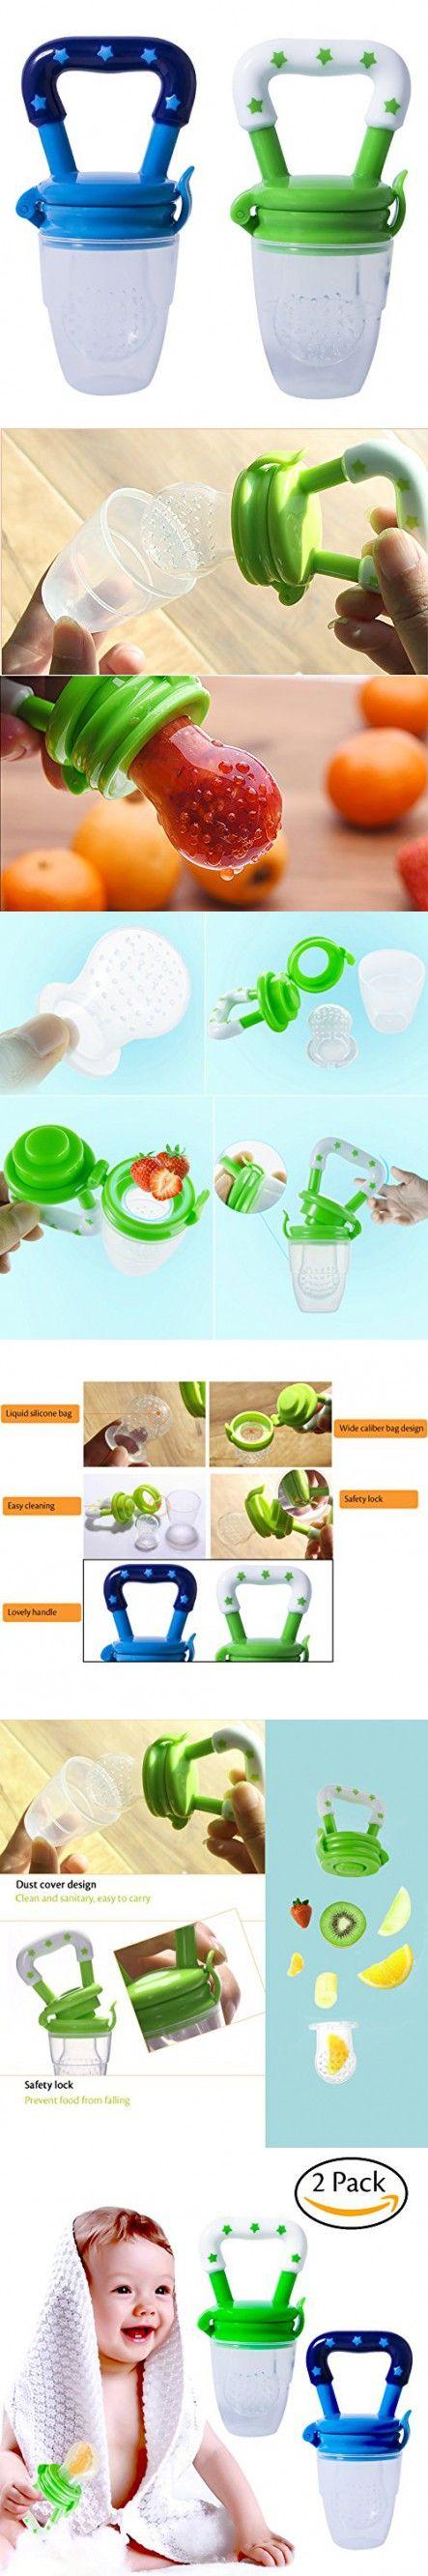 Hibery 2 Pack Baby Food Feeder, Baby Fruit Net, Fresh Food Feeding Pacifier, Fruit Teether, Silicone Feeder with Fresh Food